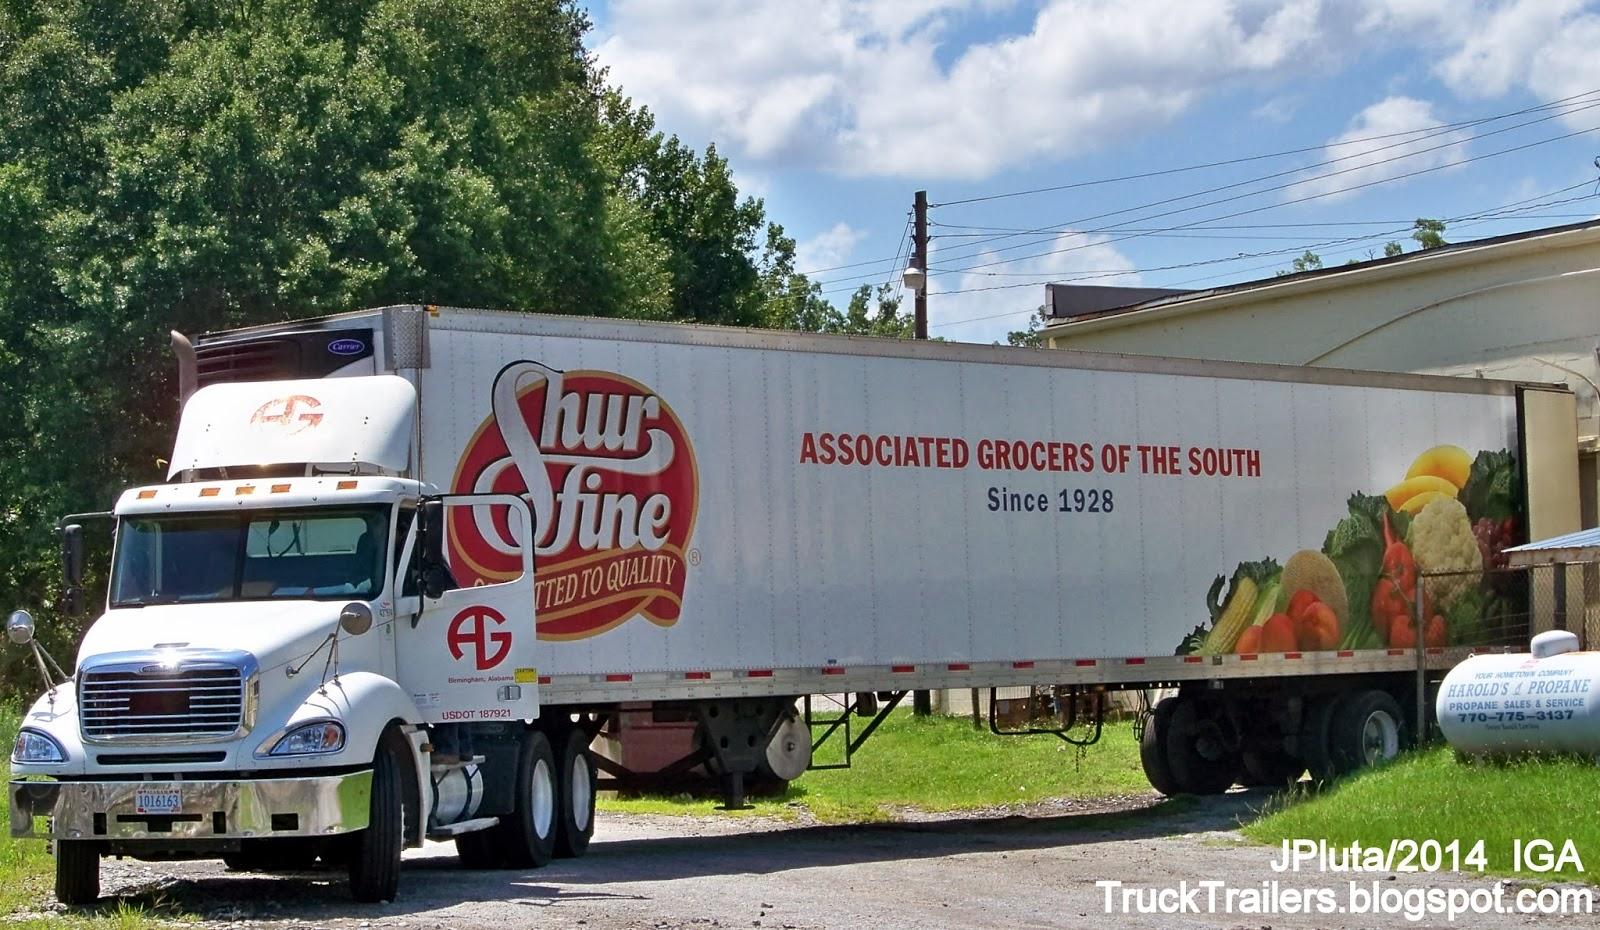 Used Food Trucks For Sale In Birmingham Al